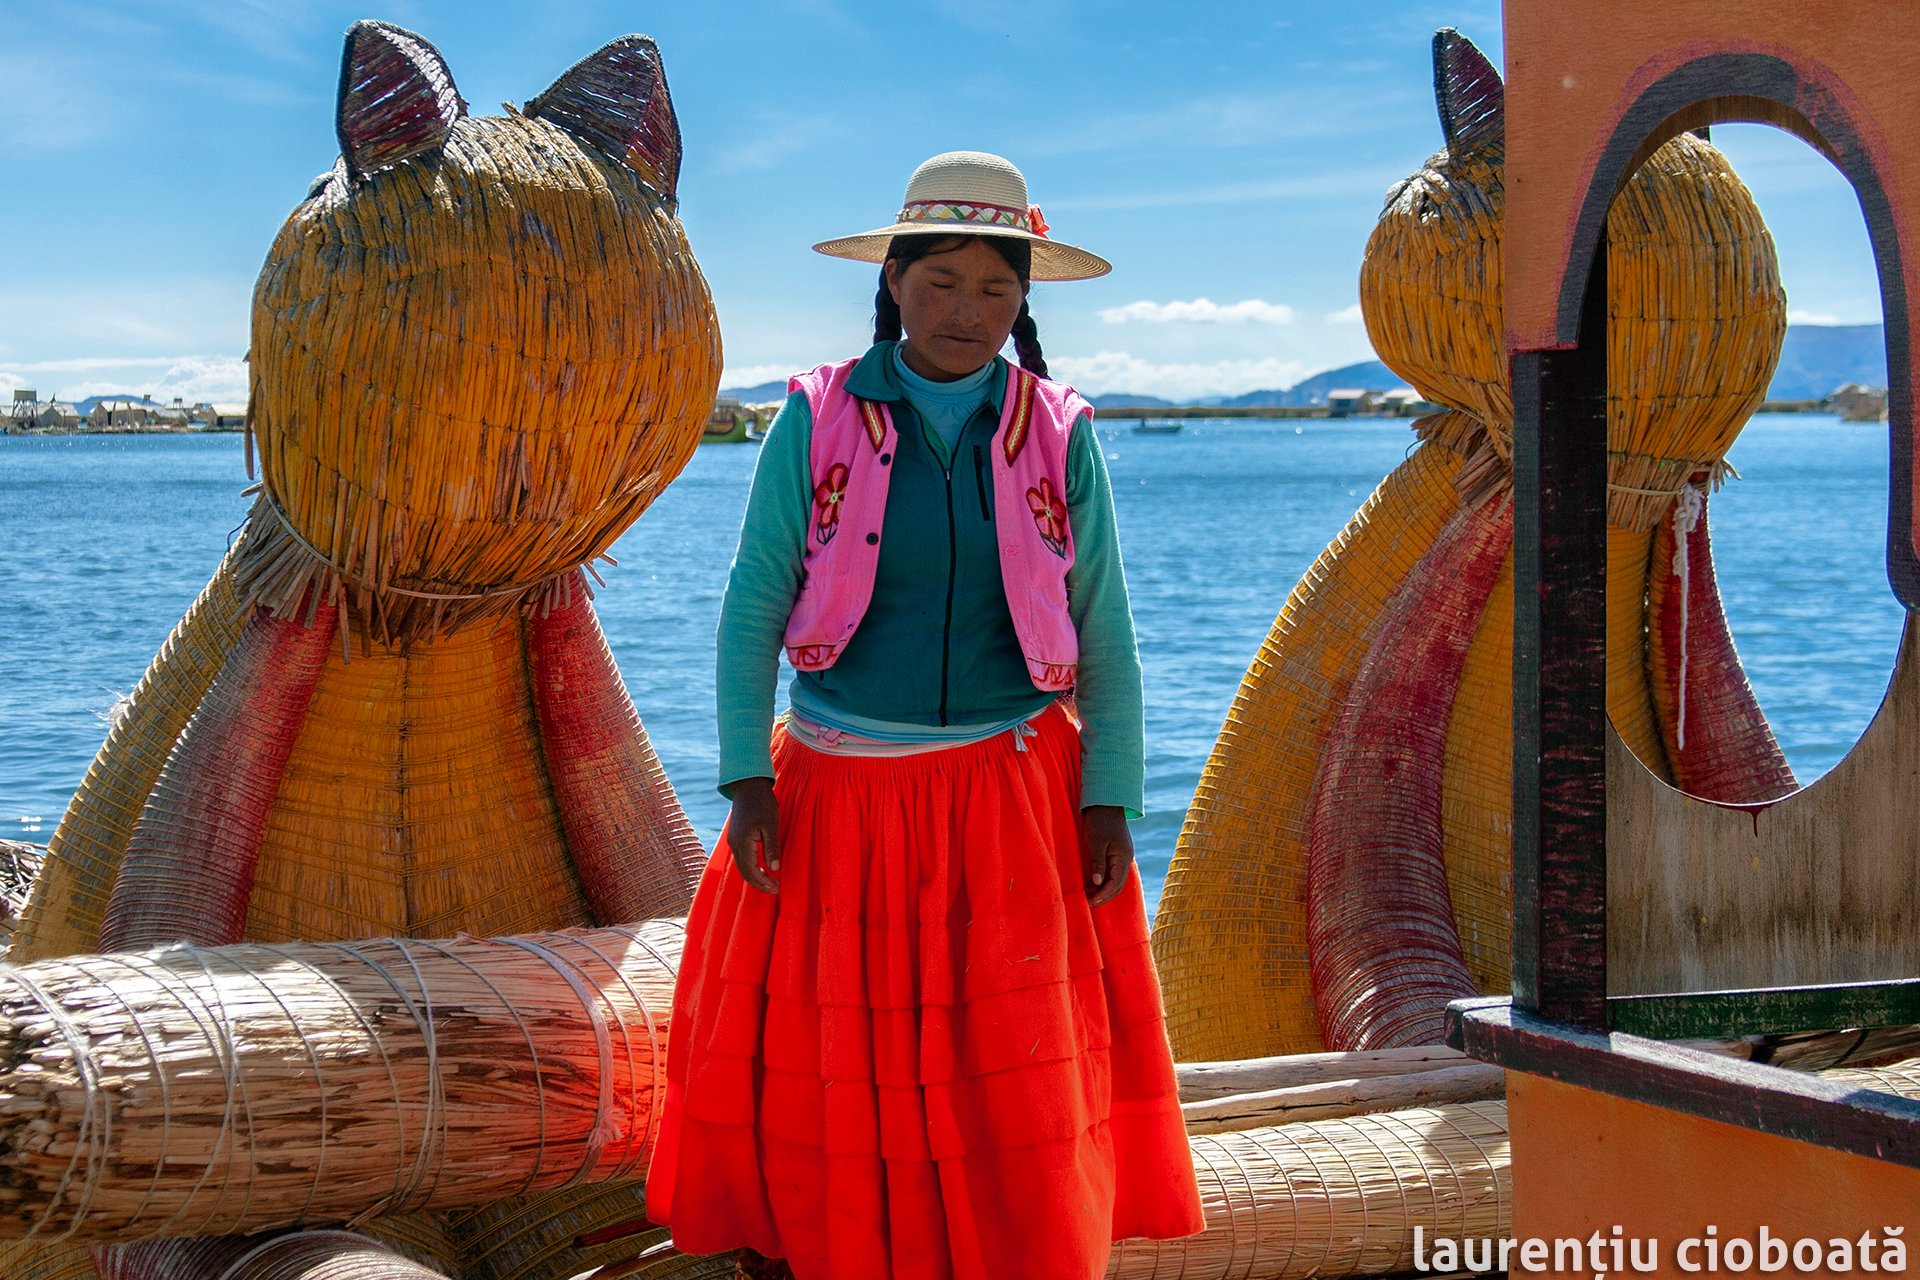 030_TiticacaLAU_0311